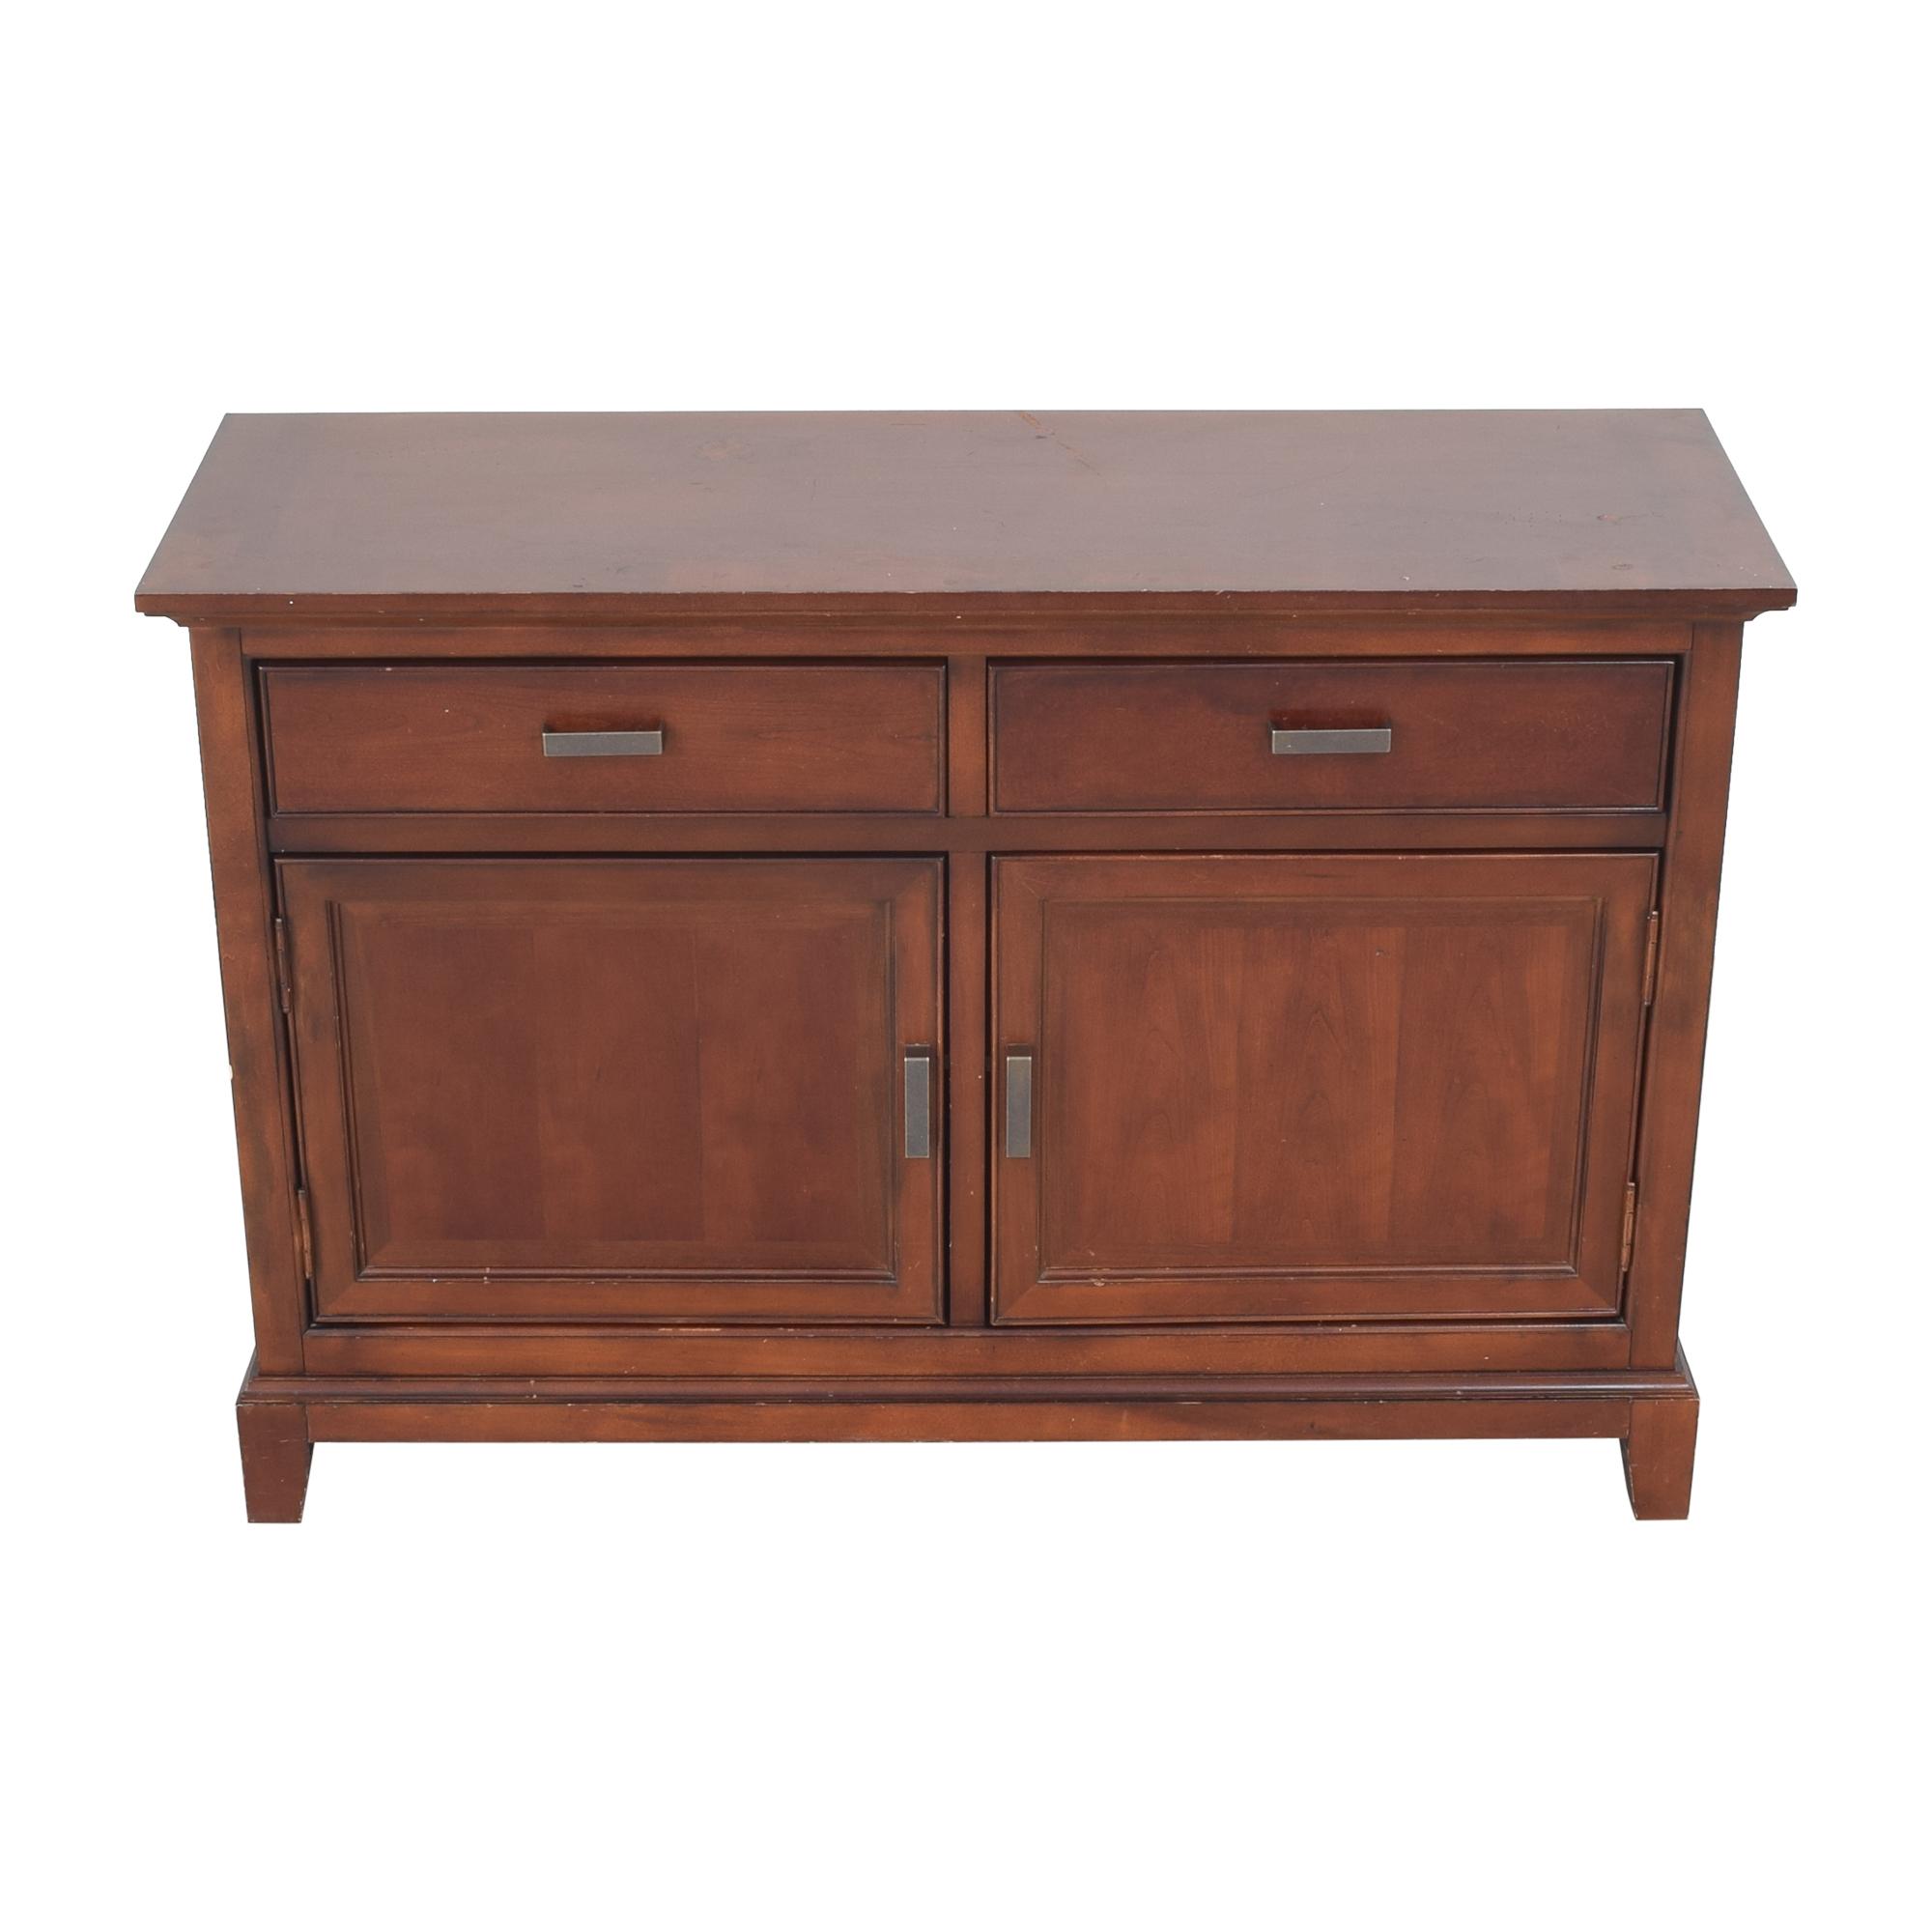 Legacy Classic Furniture Legacy Classic Buffet Cabinet nj